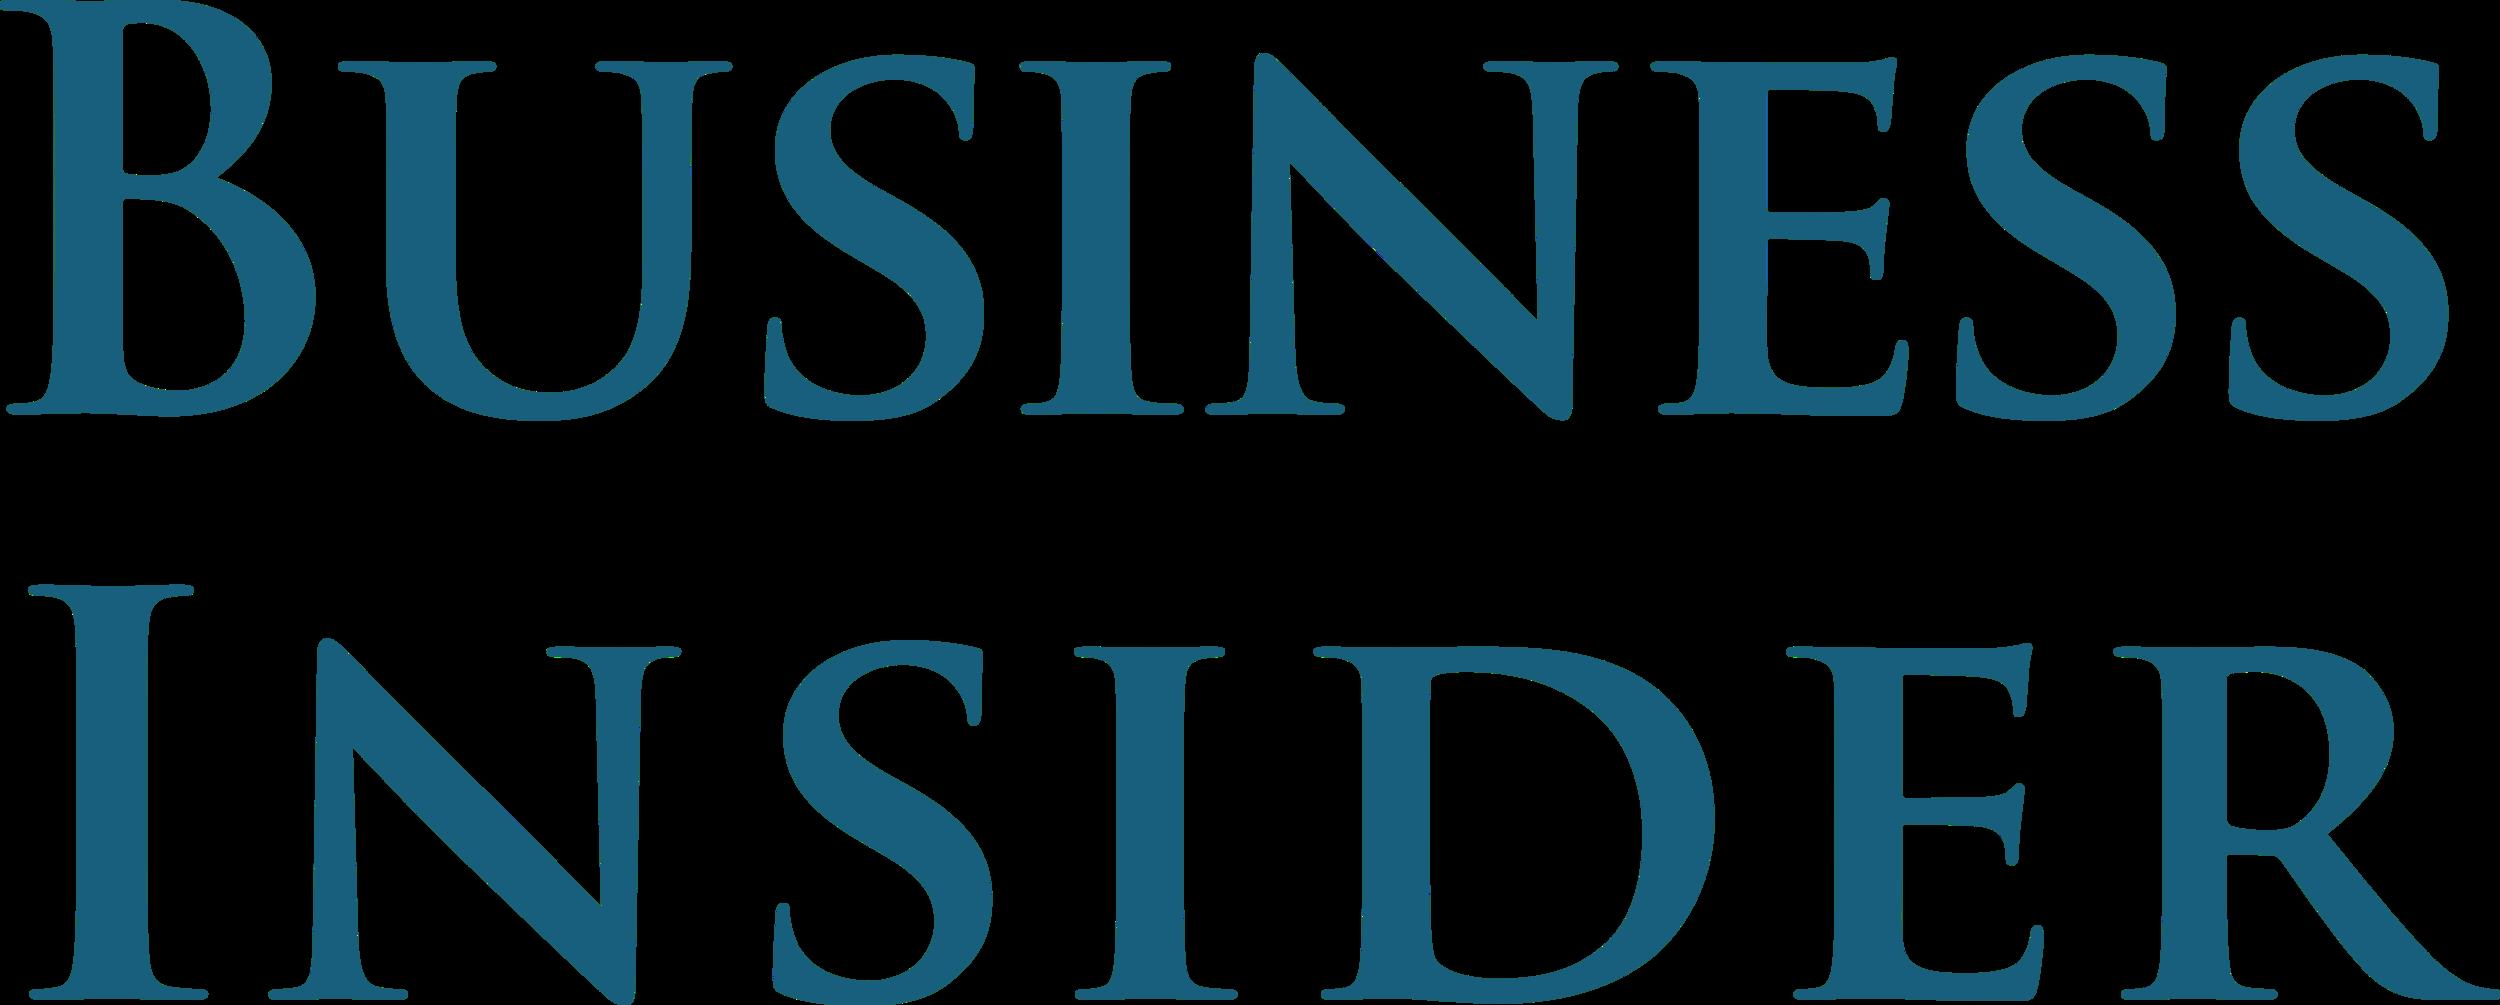 http://www.businessinsider.com/most-eligible-social-media-stars-according-to-hinge-2017-5/#no-9-eylul-savas-22